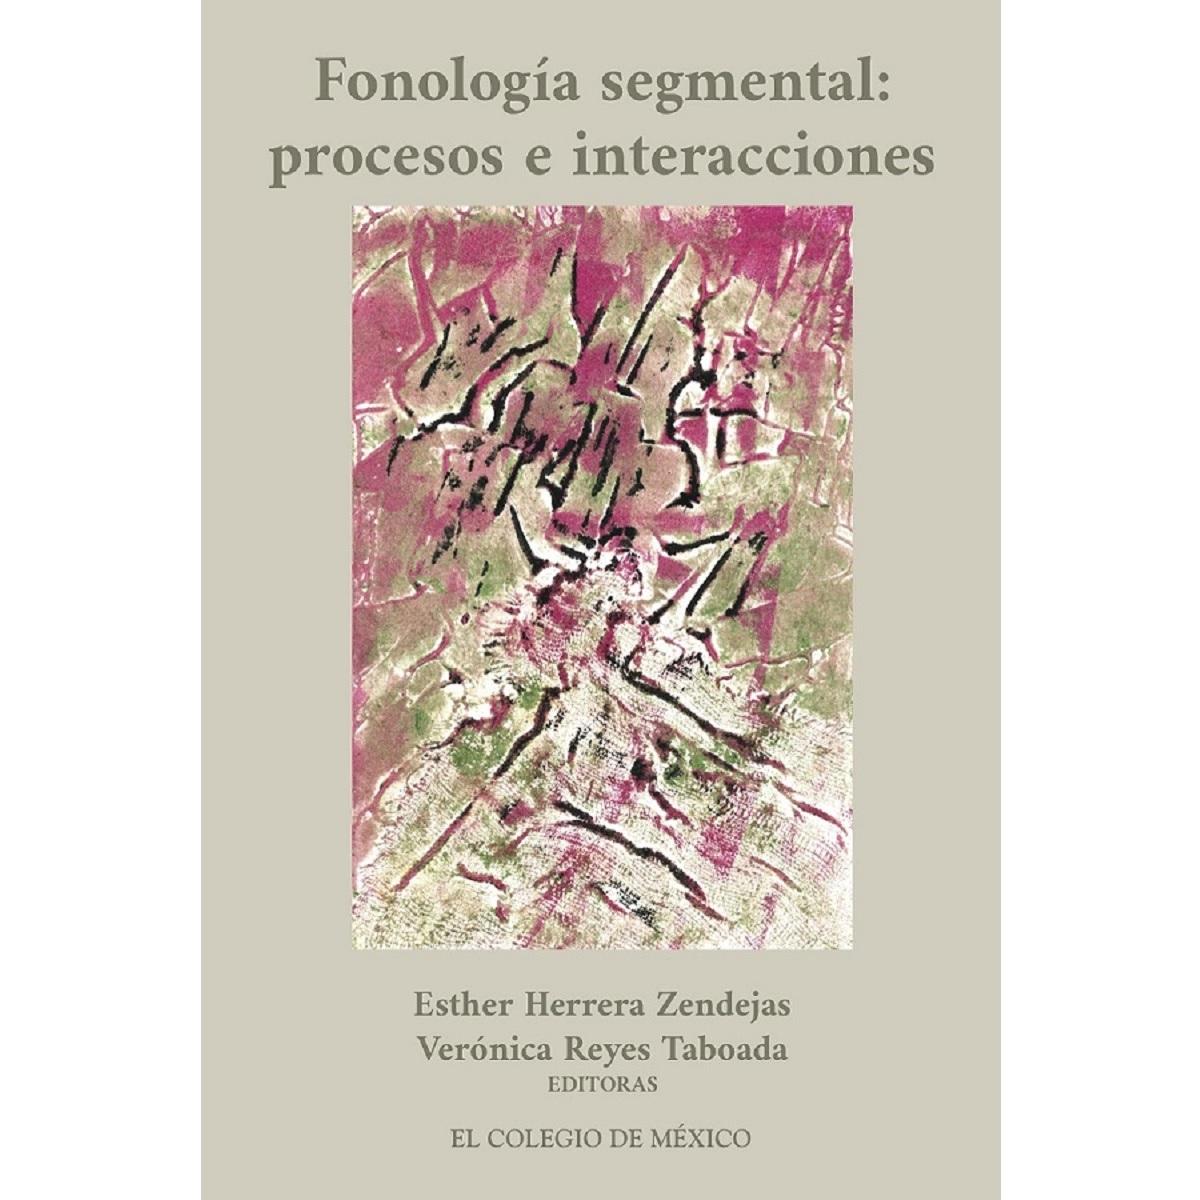 Fonología segmental: